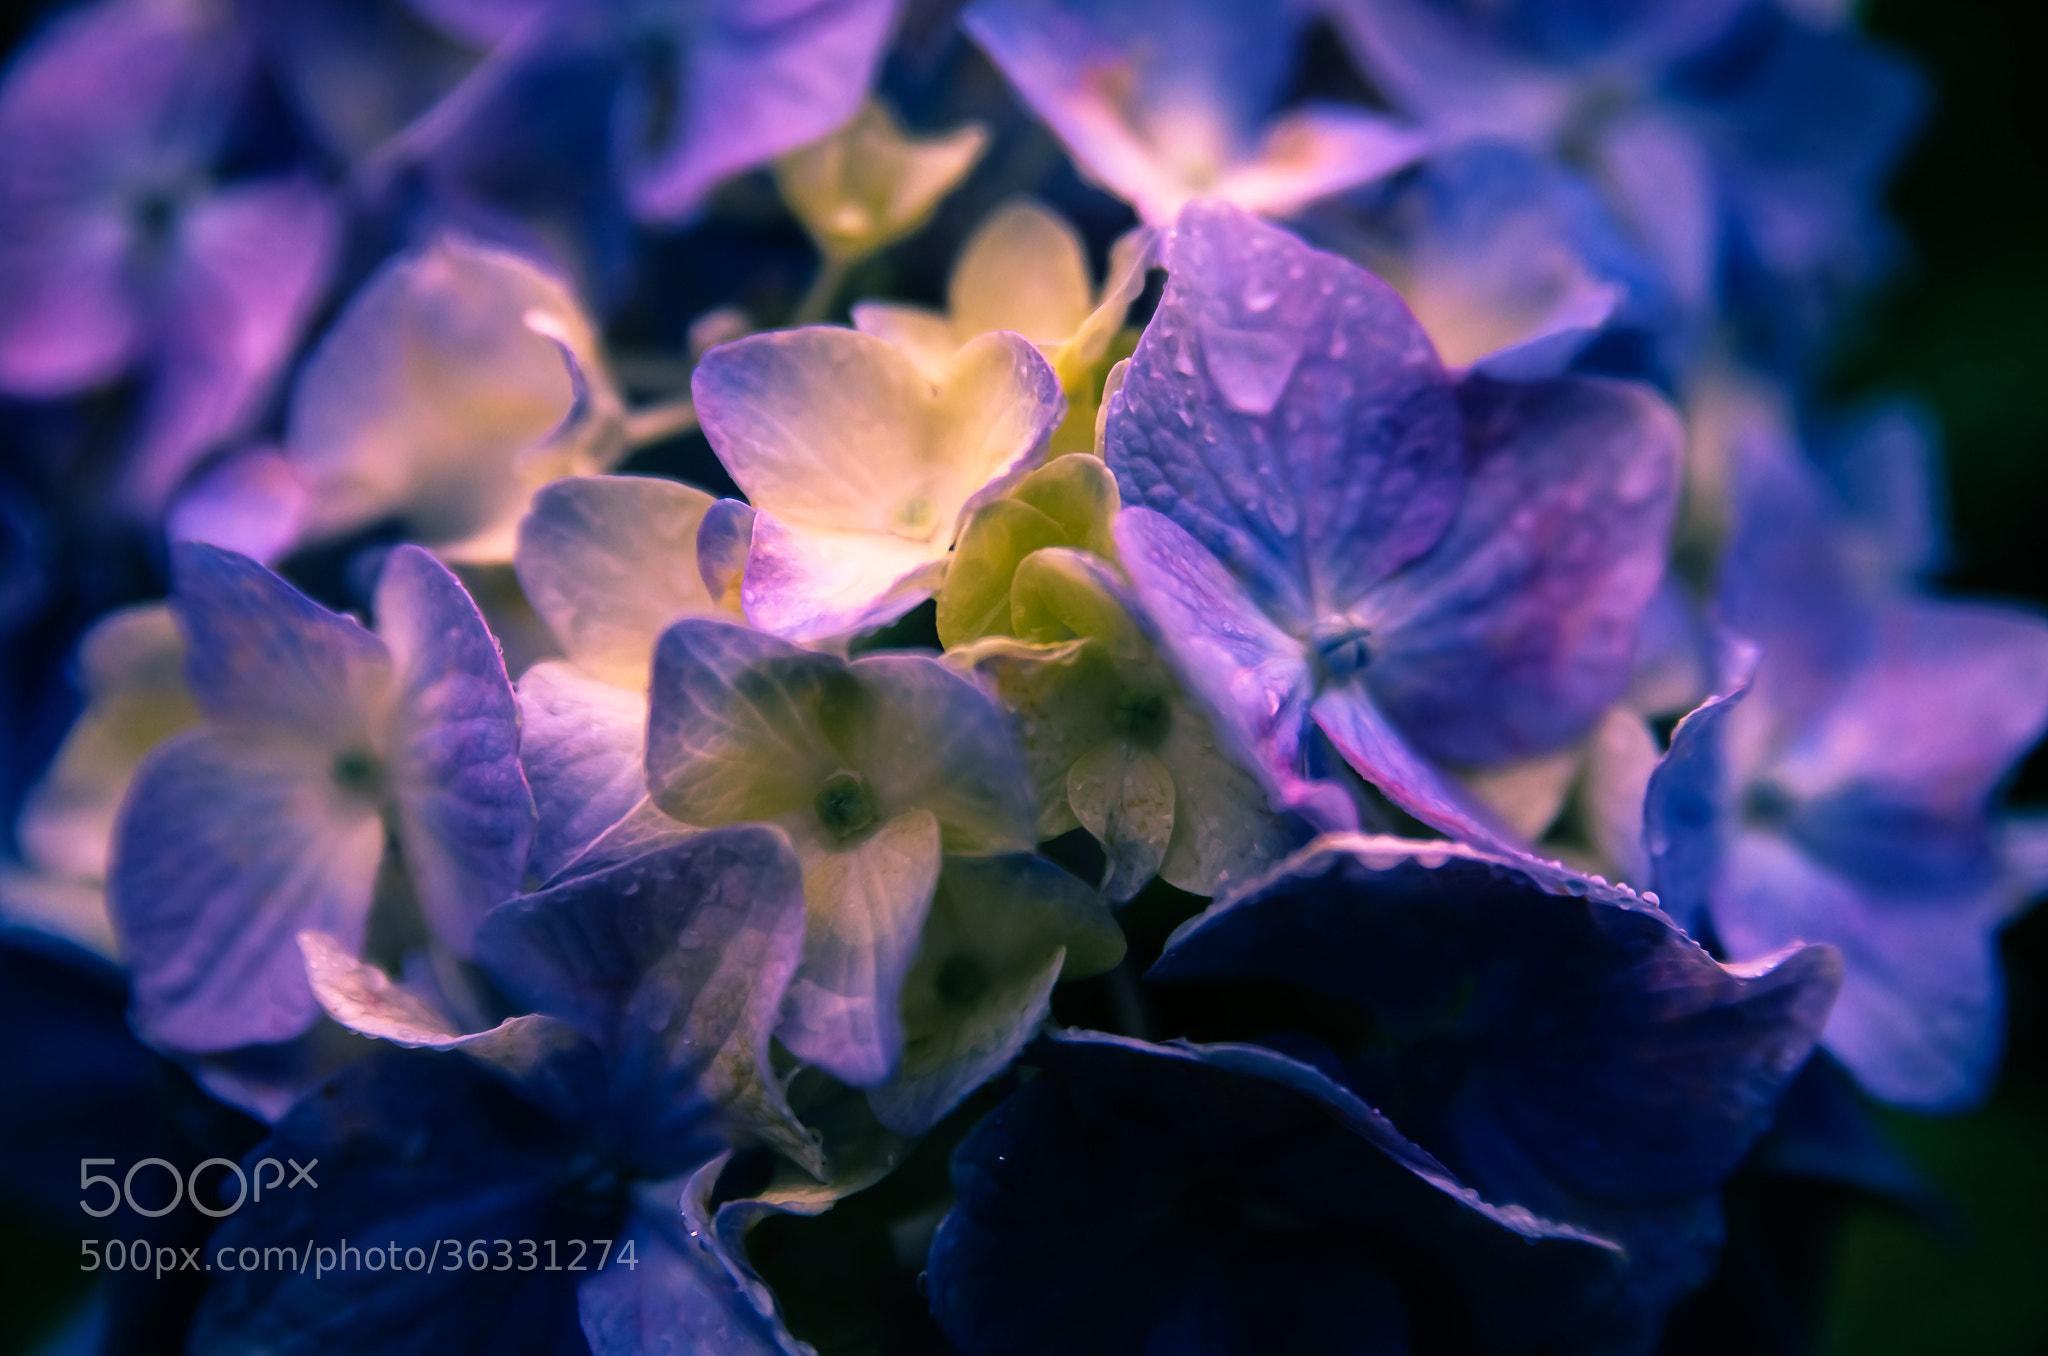 Photograph Hydrangea by Sachiko Kawakami on 500px